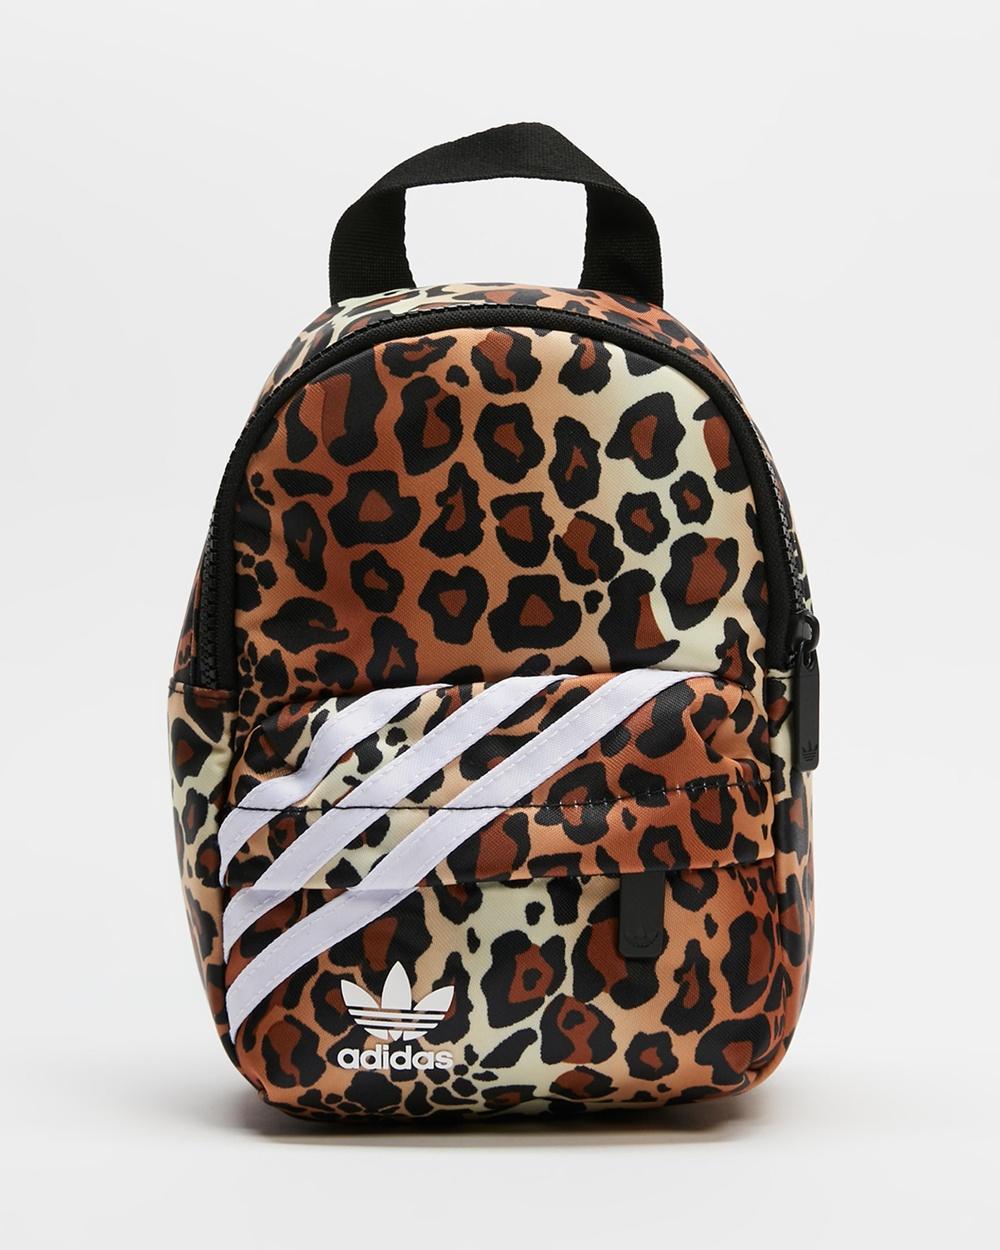 adidas Originals Mini Backpack Backpacks Brown & White